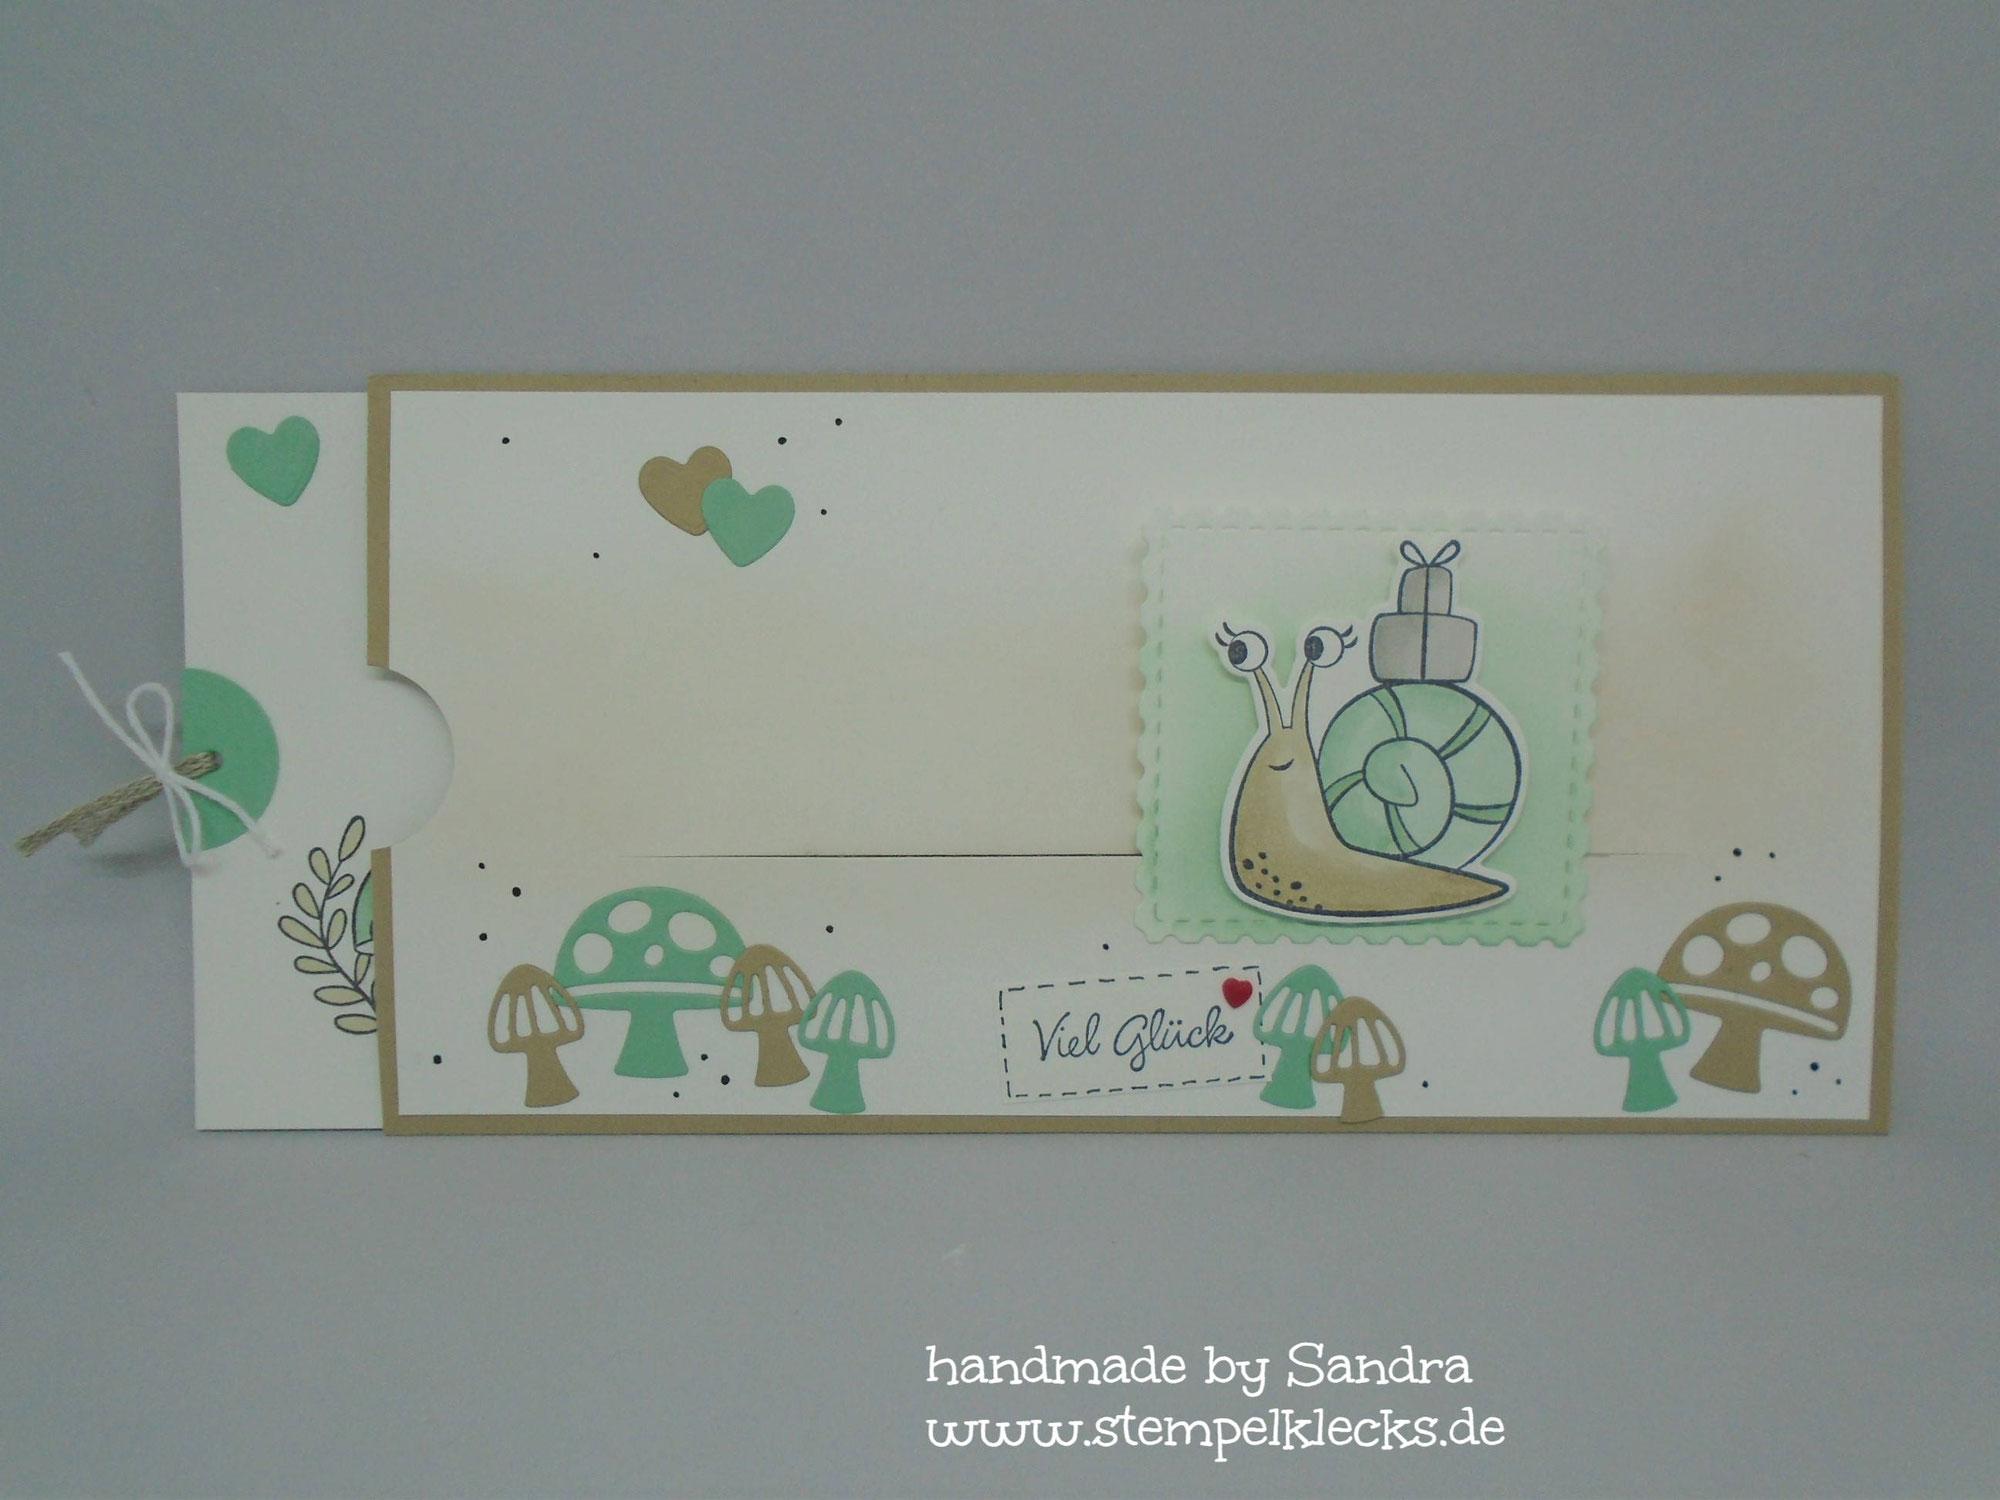 Schneckenpost - Ziehkarte mit Schiebeelement